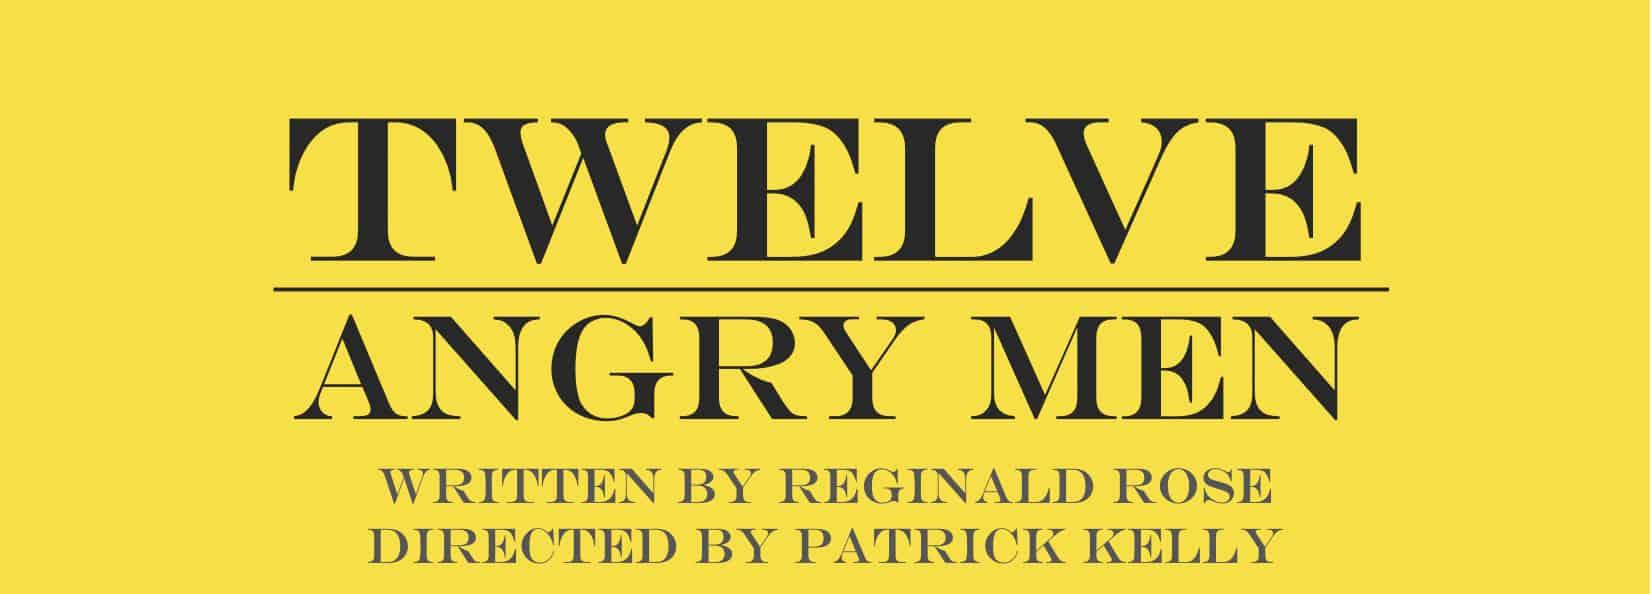 Twelve Angry Men by Reginald Rose – play